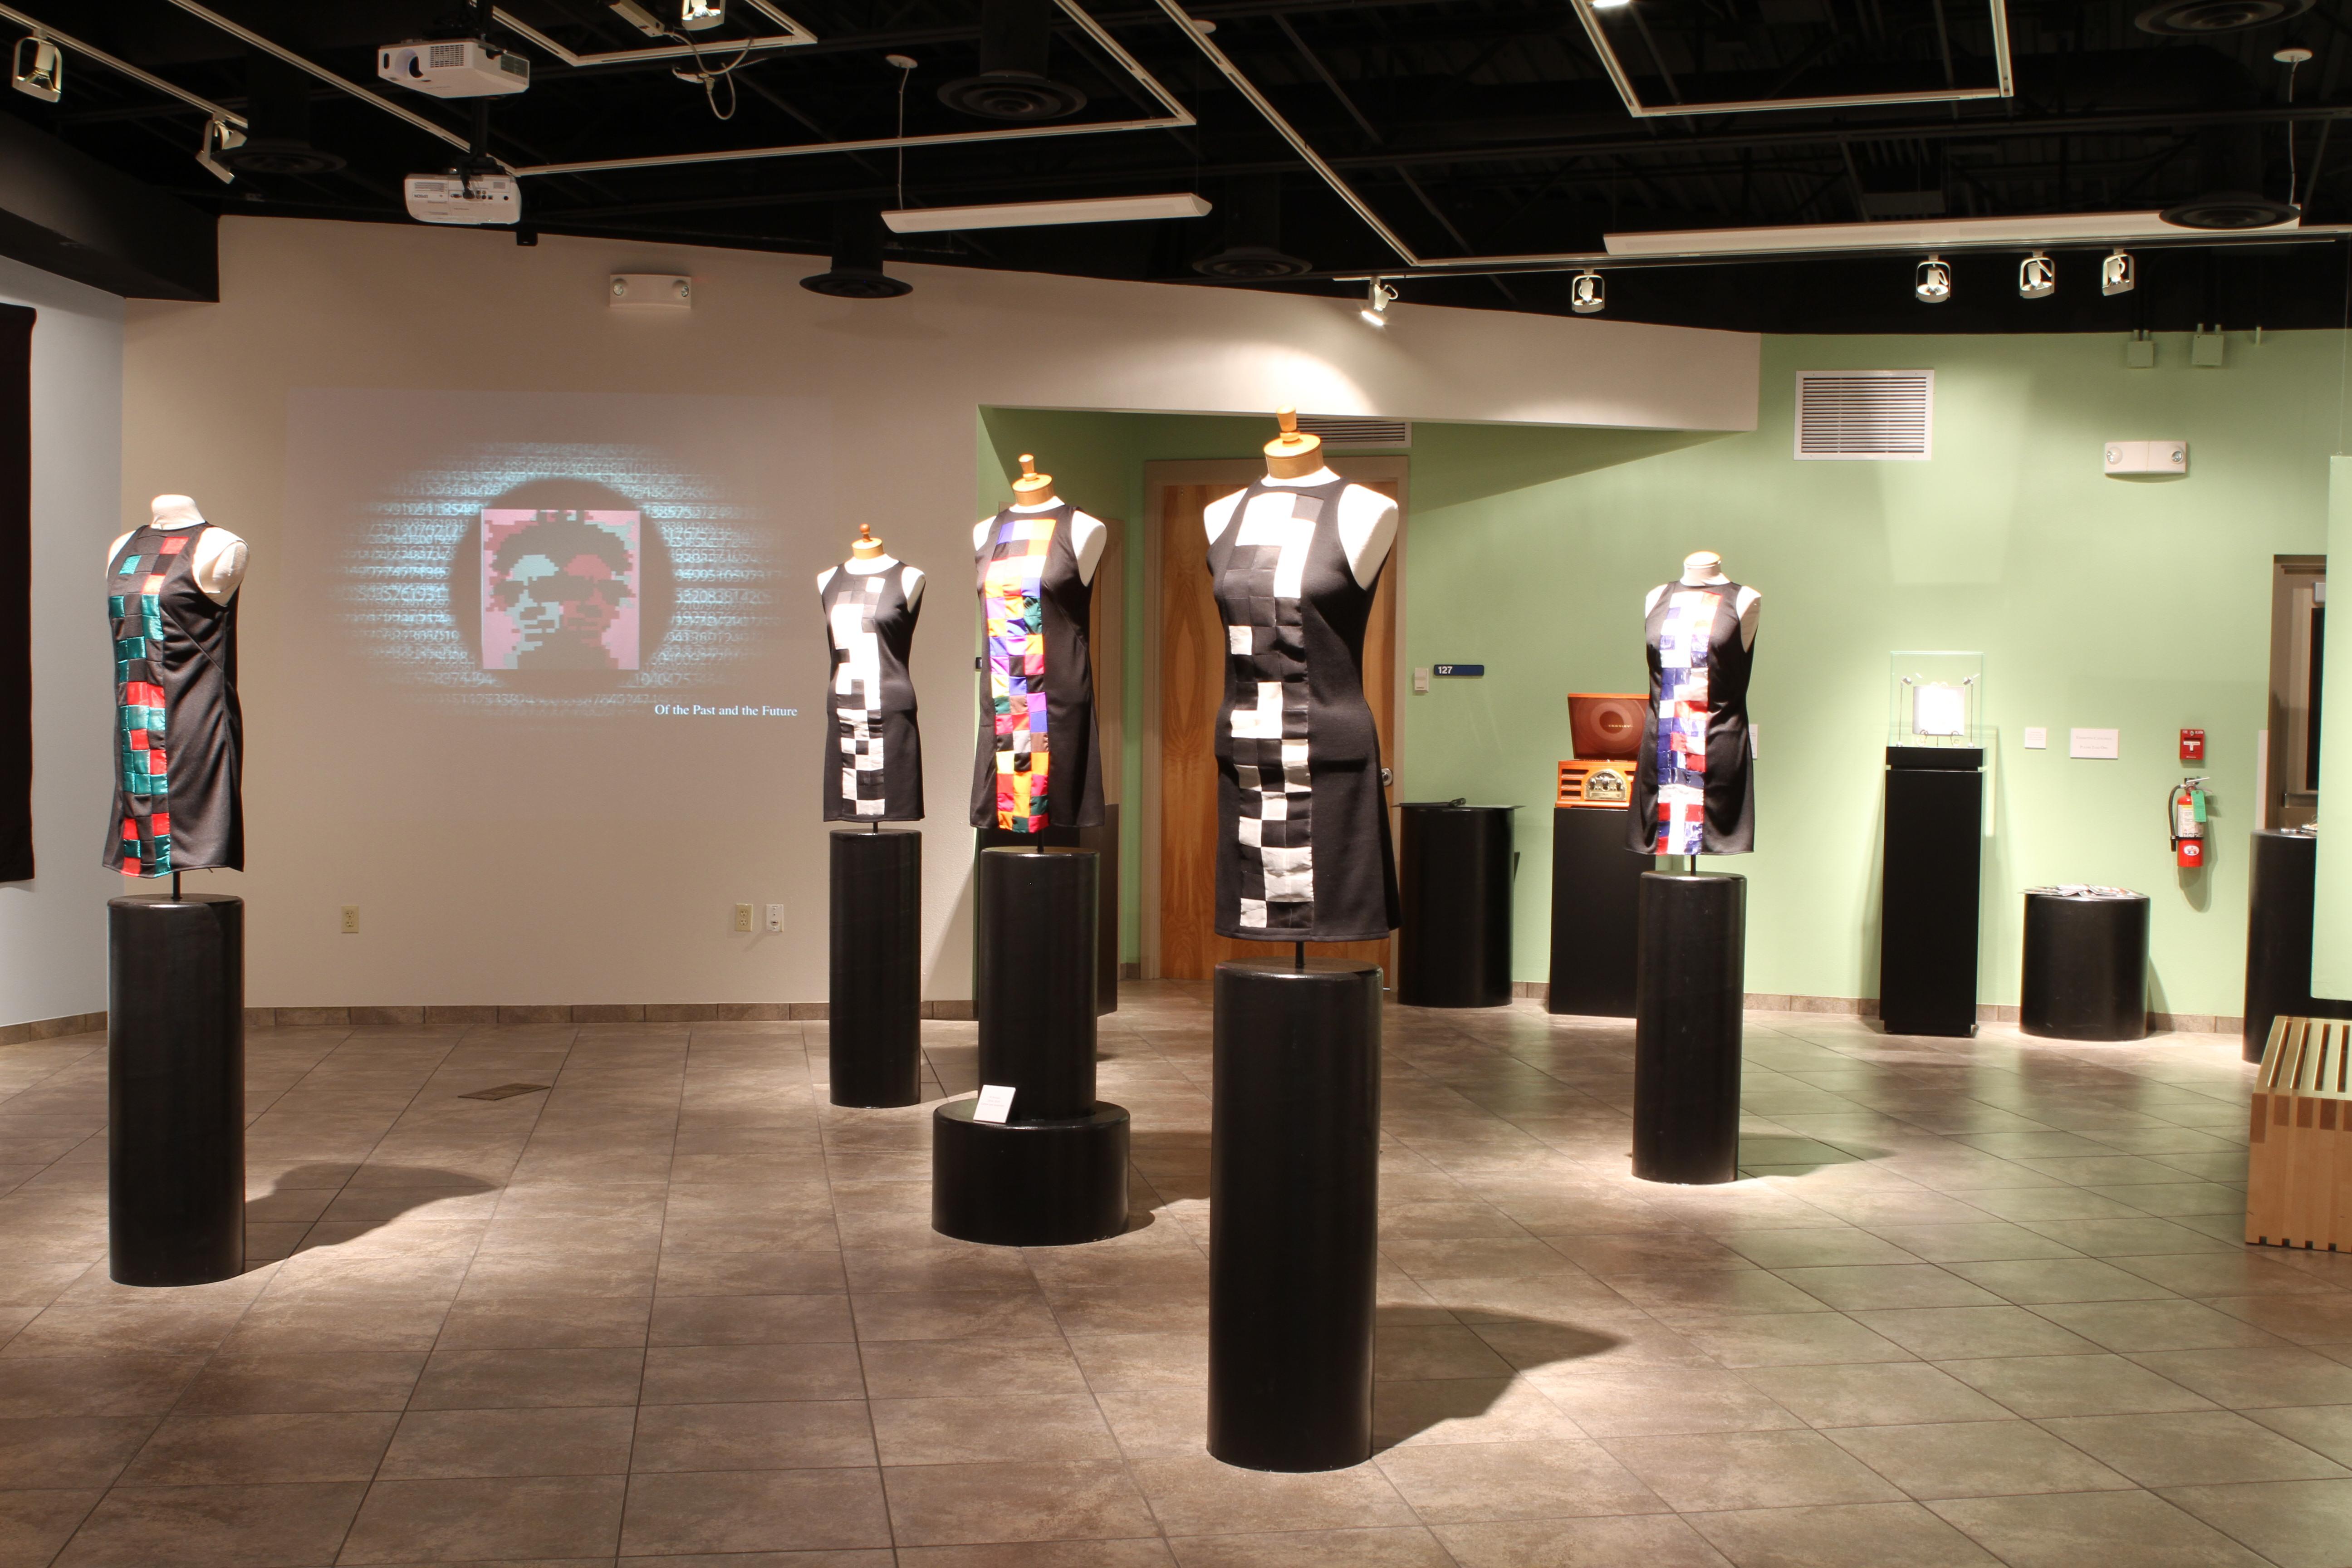 Breckenridge Art Gallery